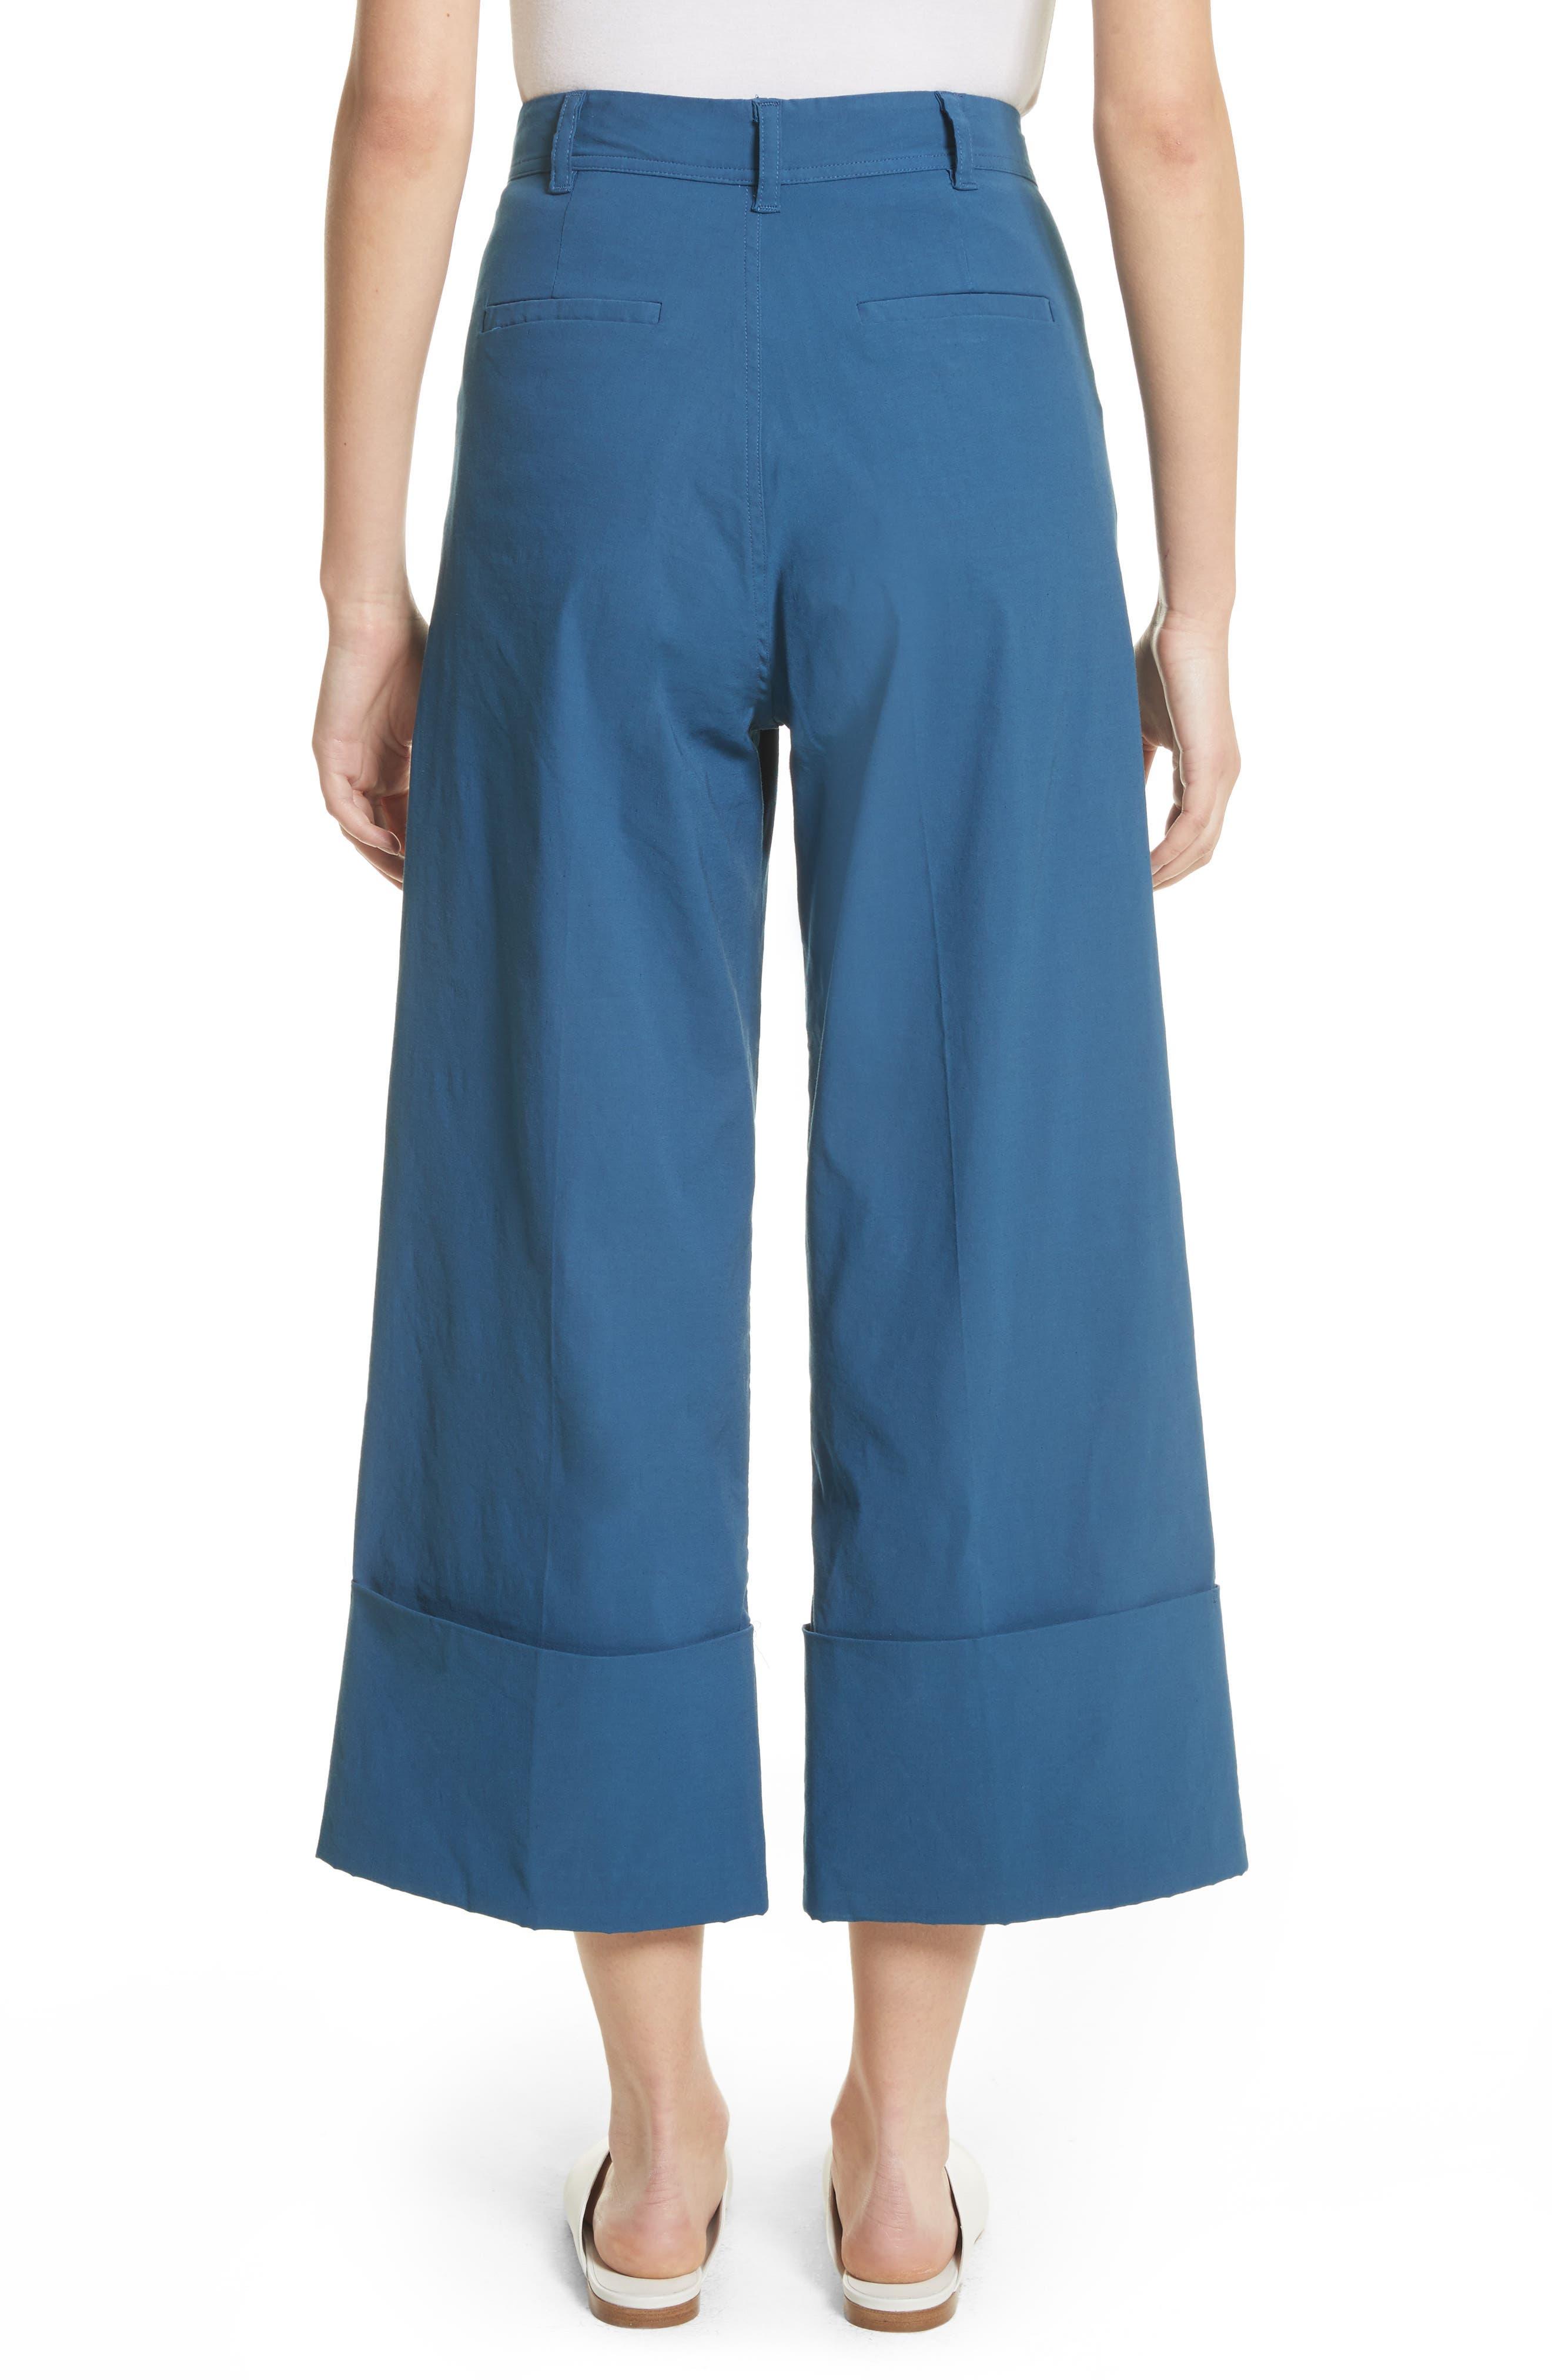 Winona Cuff Wide Leg Pants,                             Alternate thumbnail 2, color,                             Blue